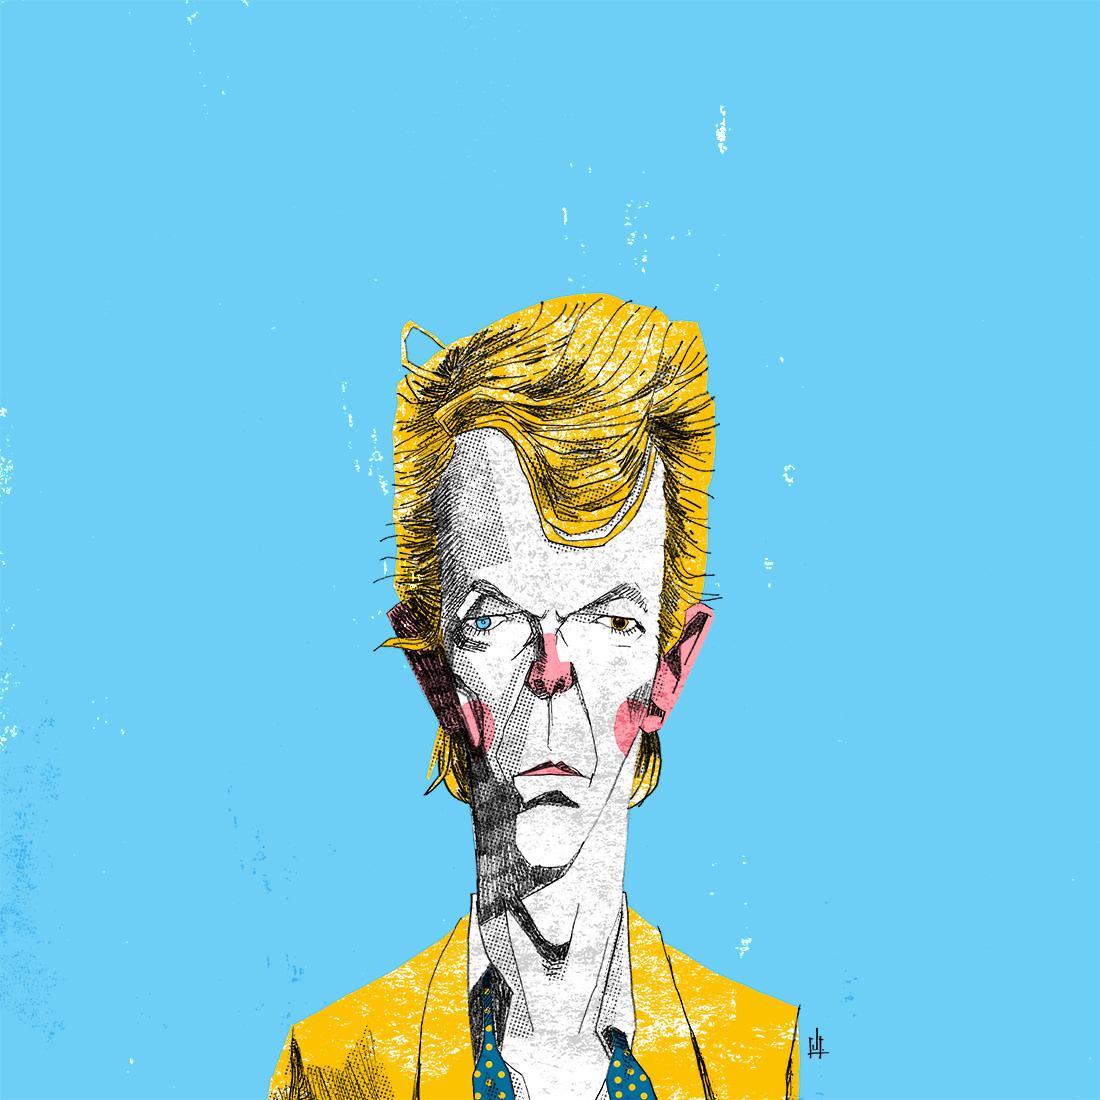 Celebrity music british portrait persona david bowie Film   Pop Art pop culture rock n roll